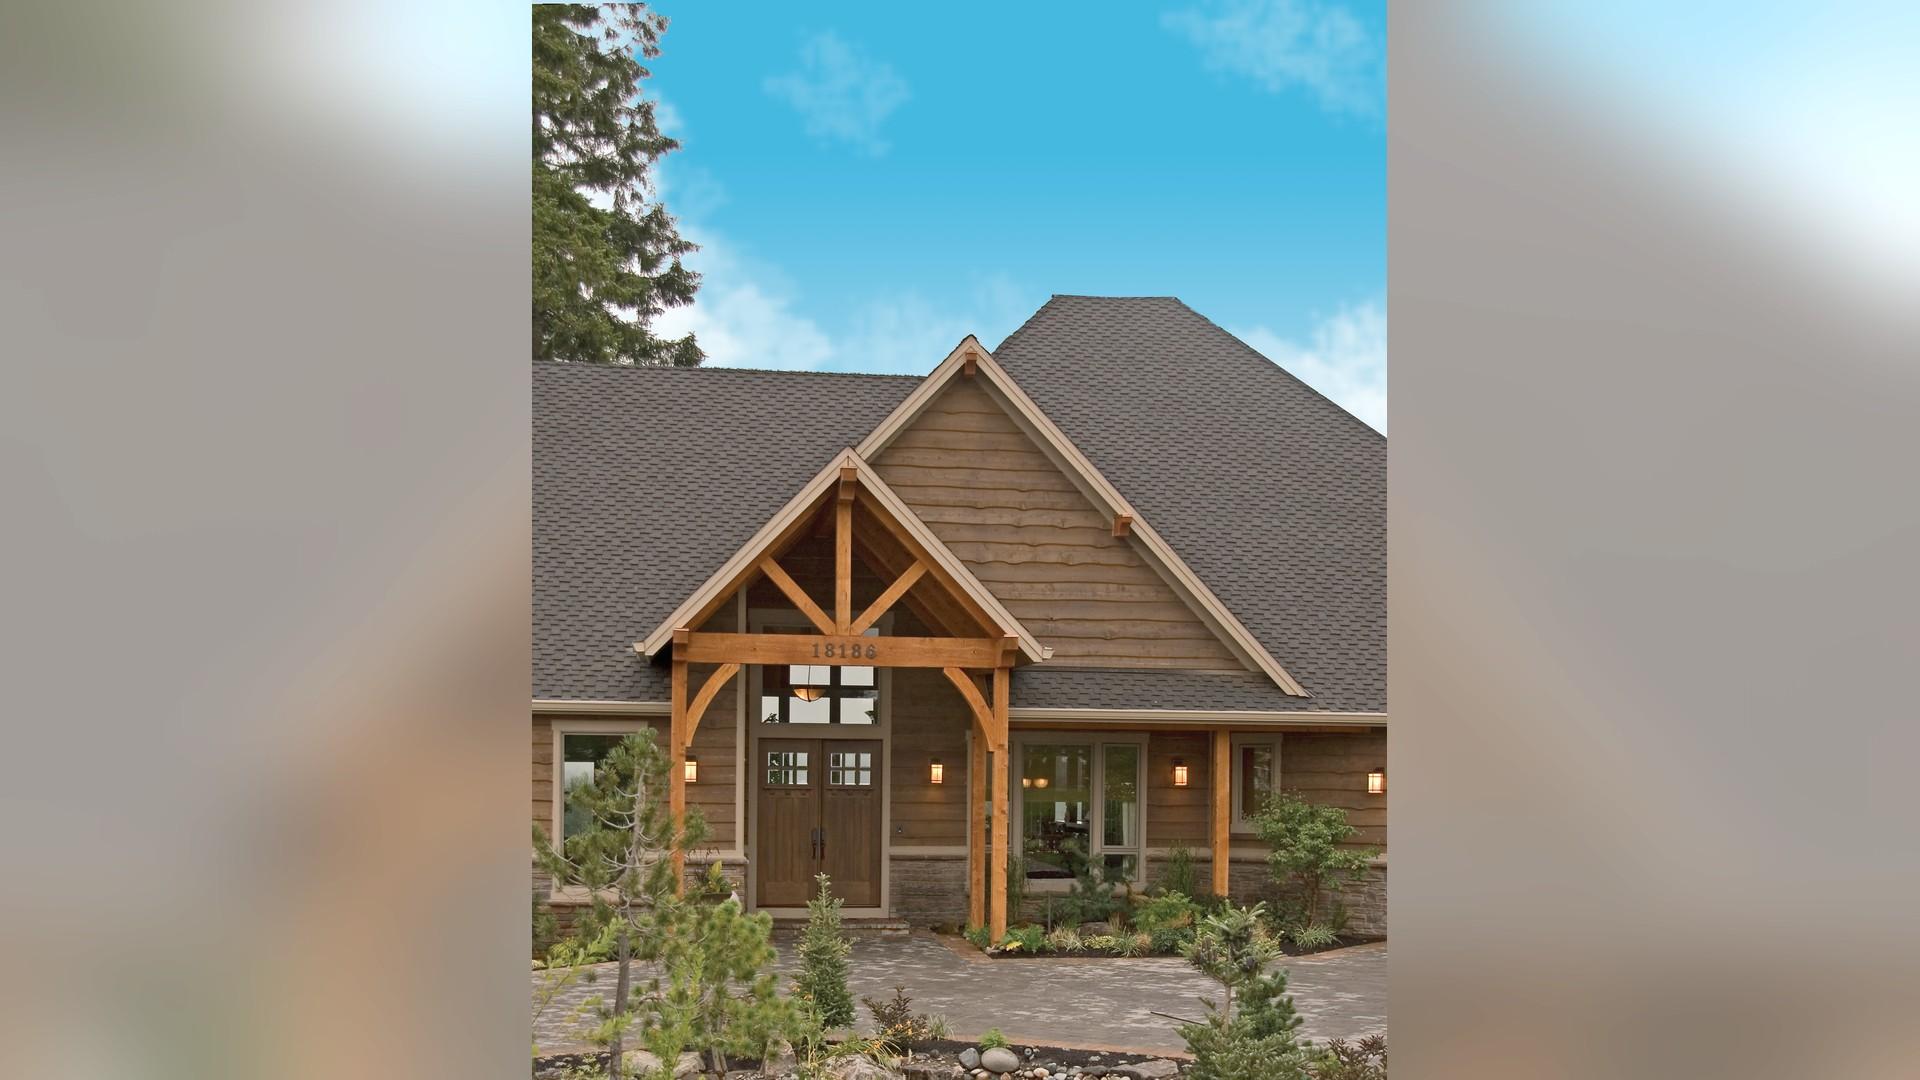 Craftsman House Plan 1411d The Timbersedge 5155 Sqft 4